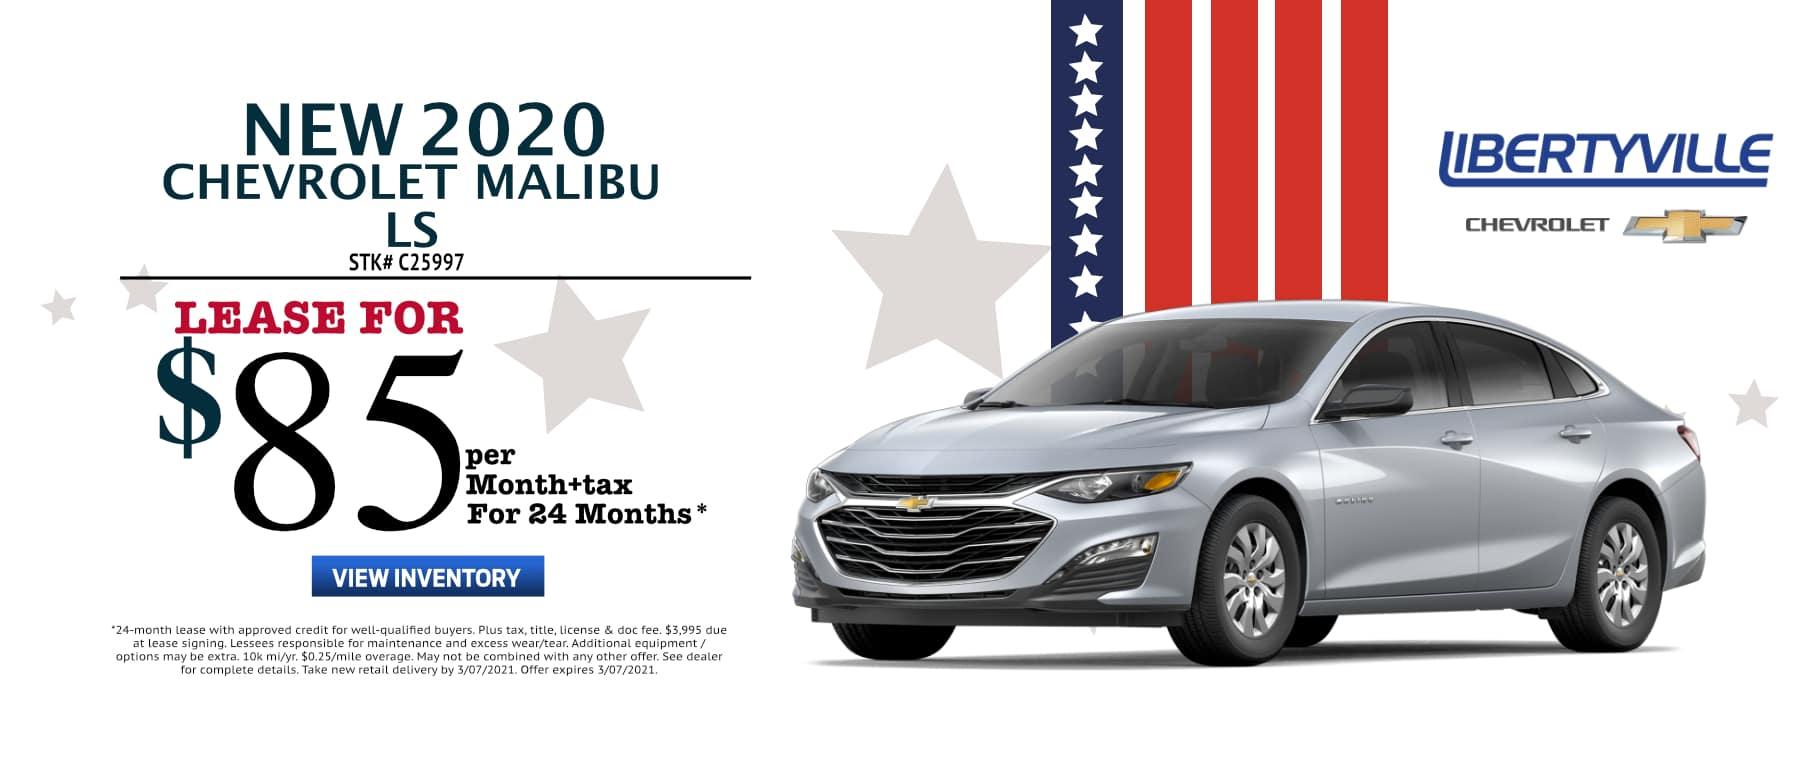 February_2021_Malibu_LEASE_Libertyville_Chevrolet